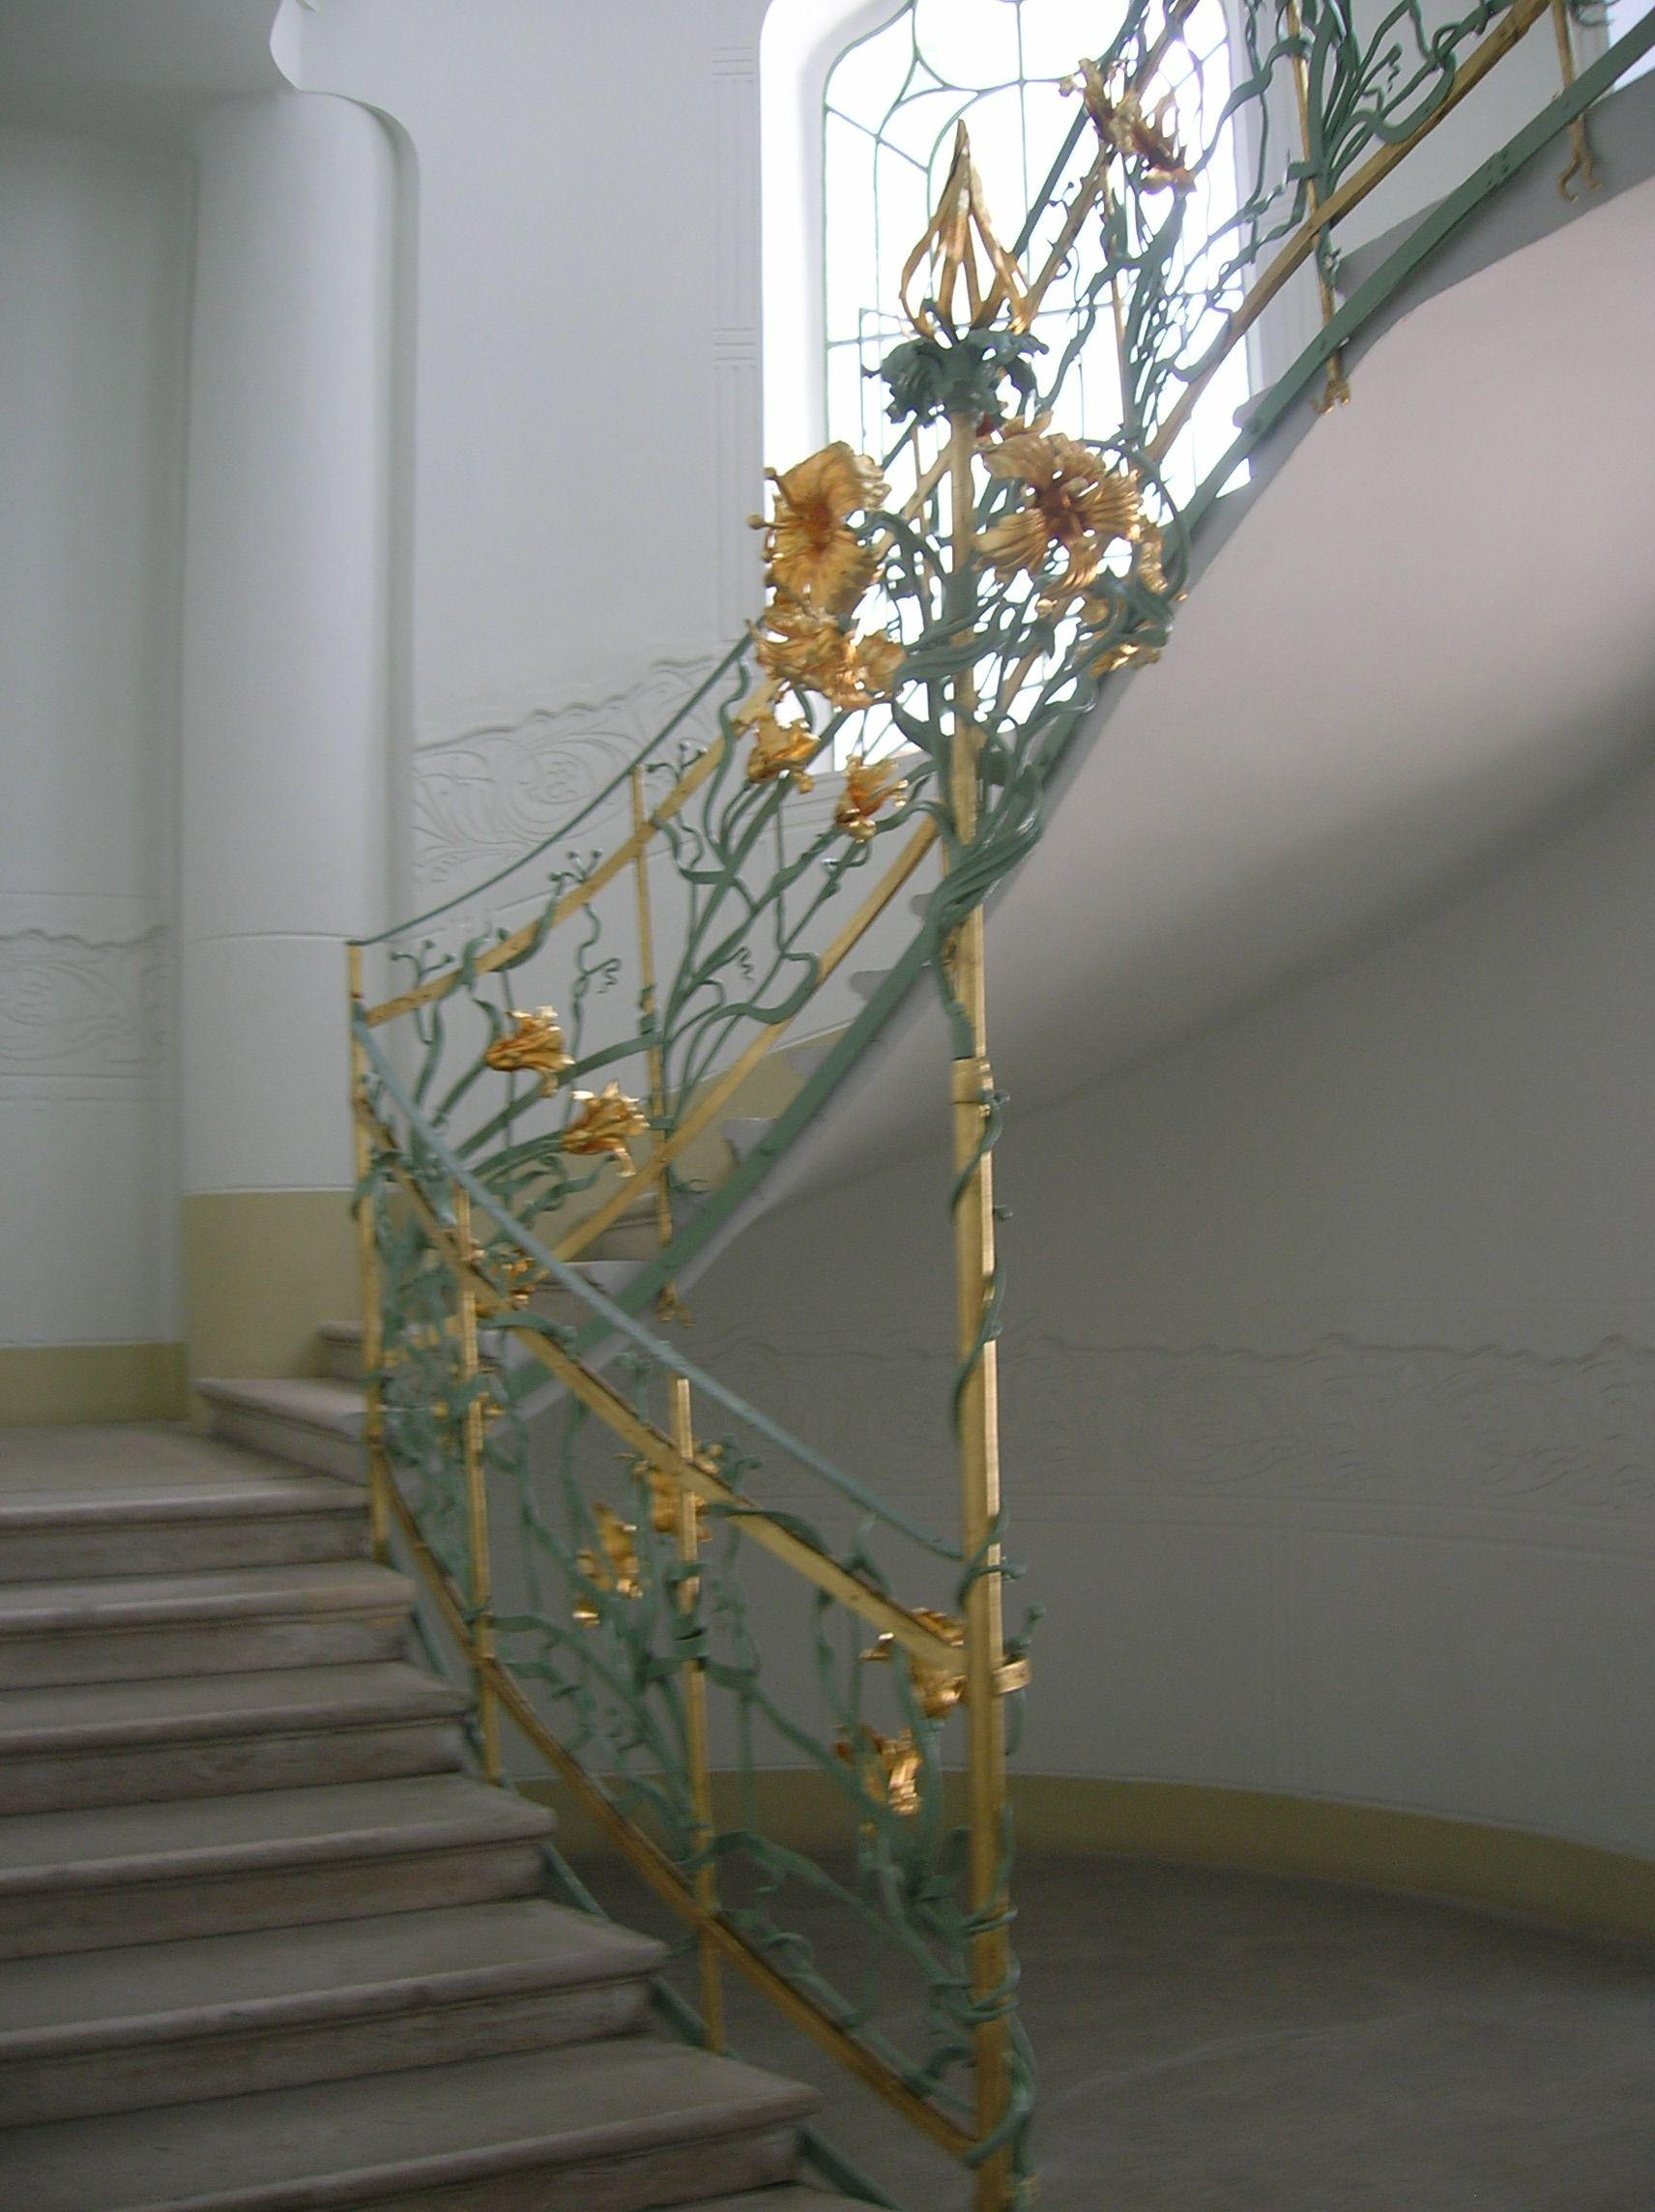 REÖK Palace - Szeged,Hungary